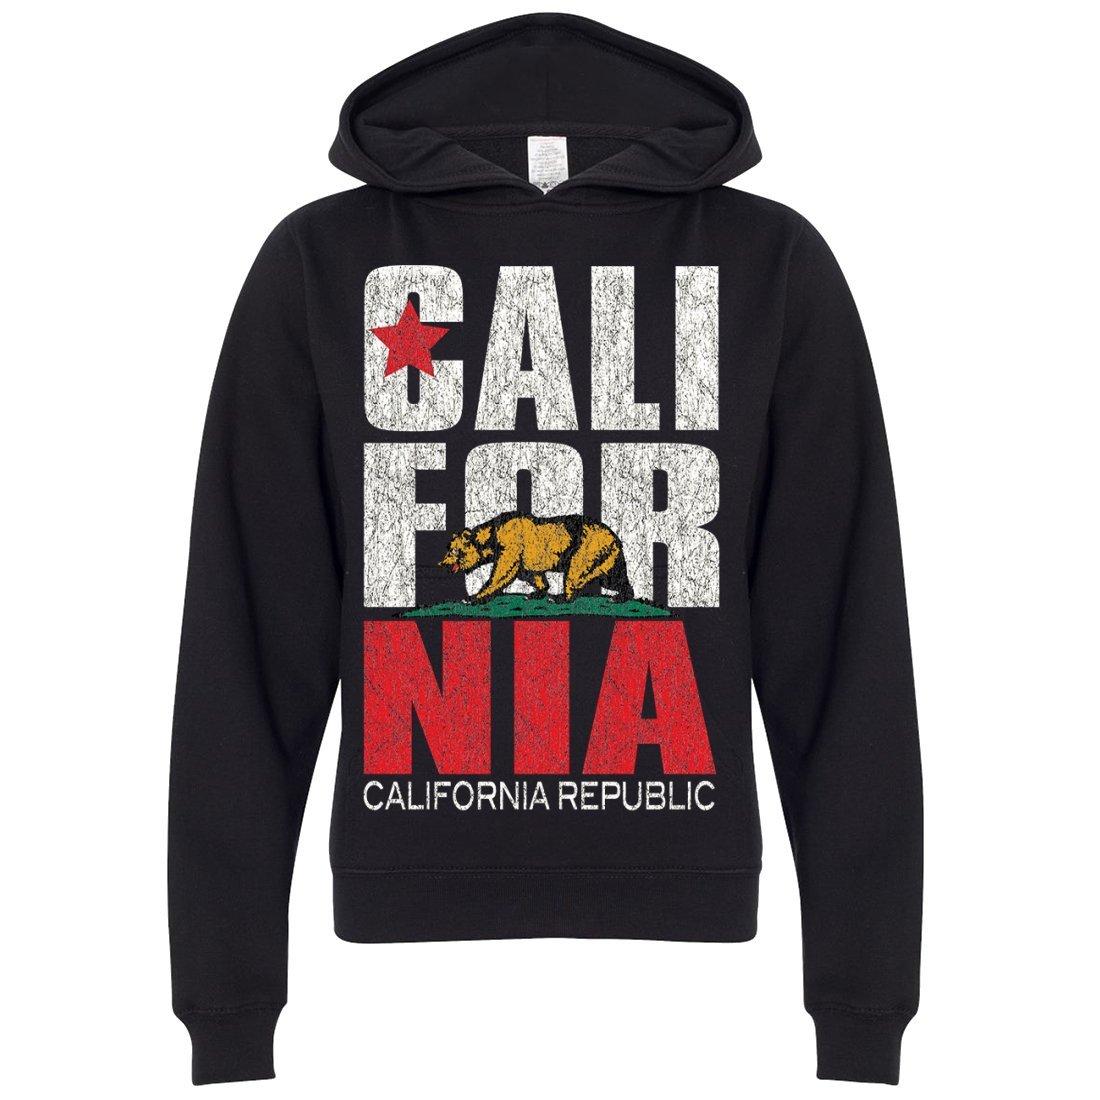 California Republic Vintage Retro Youth Sweatshirt Hoodie